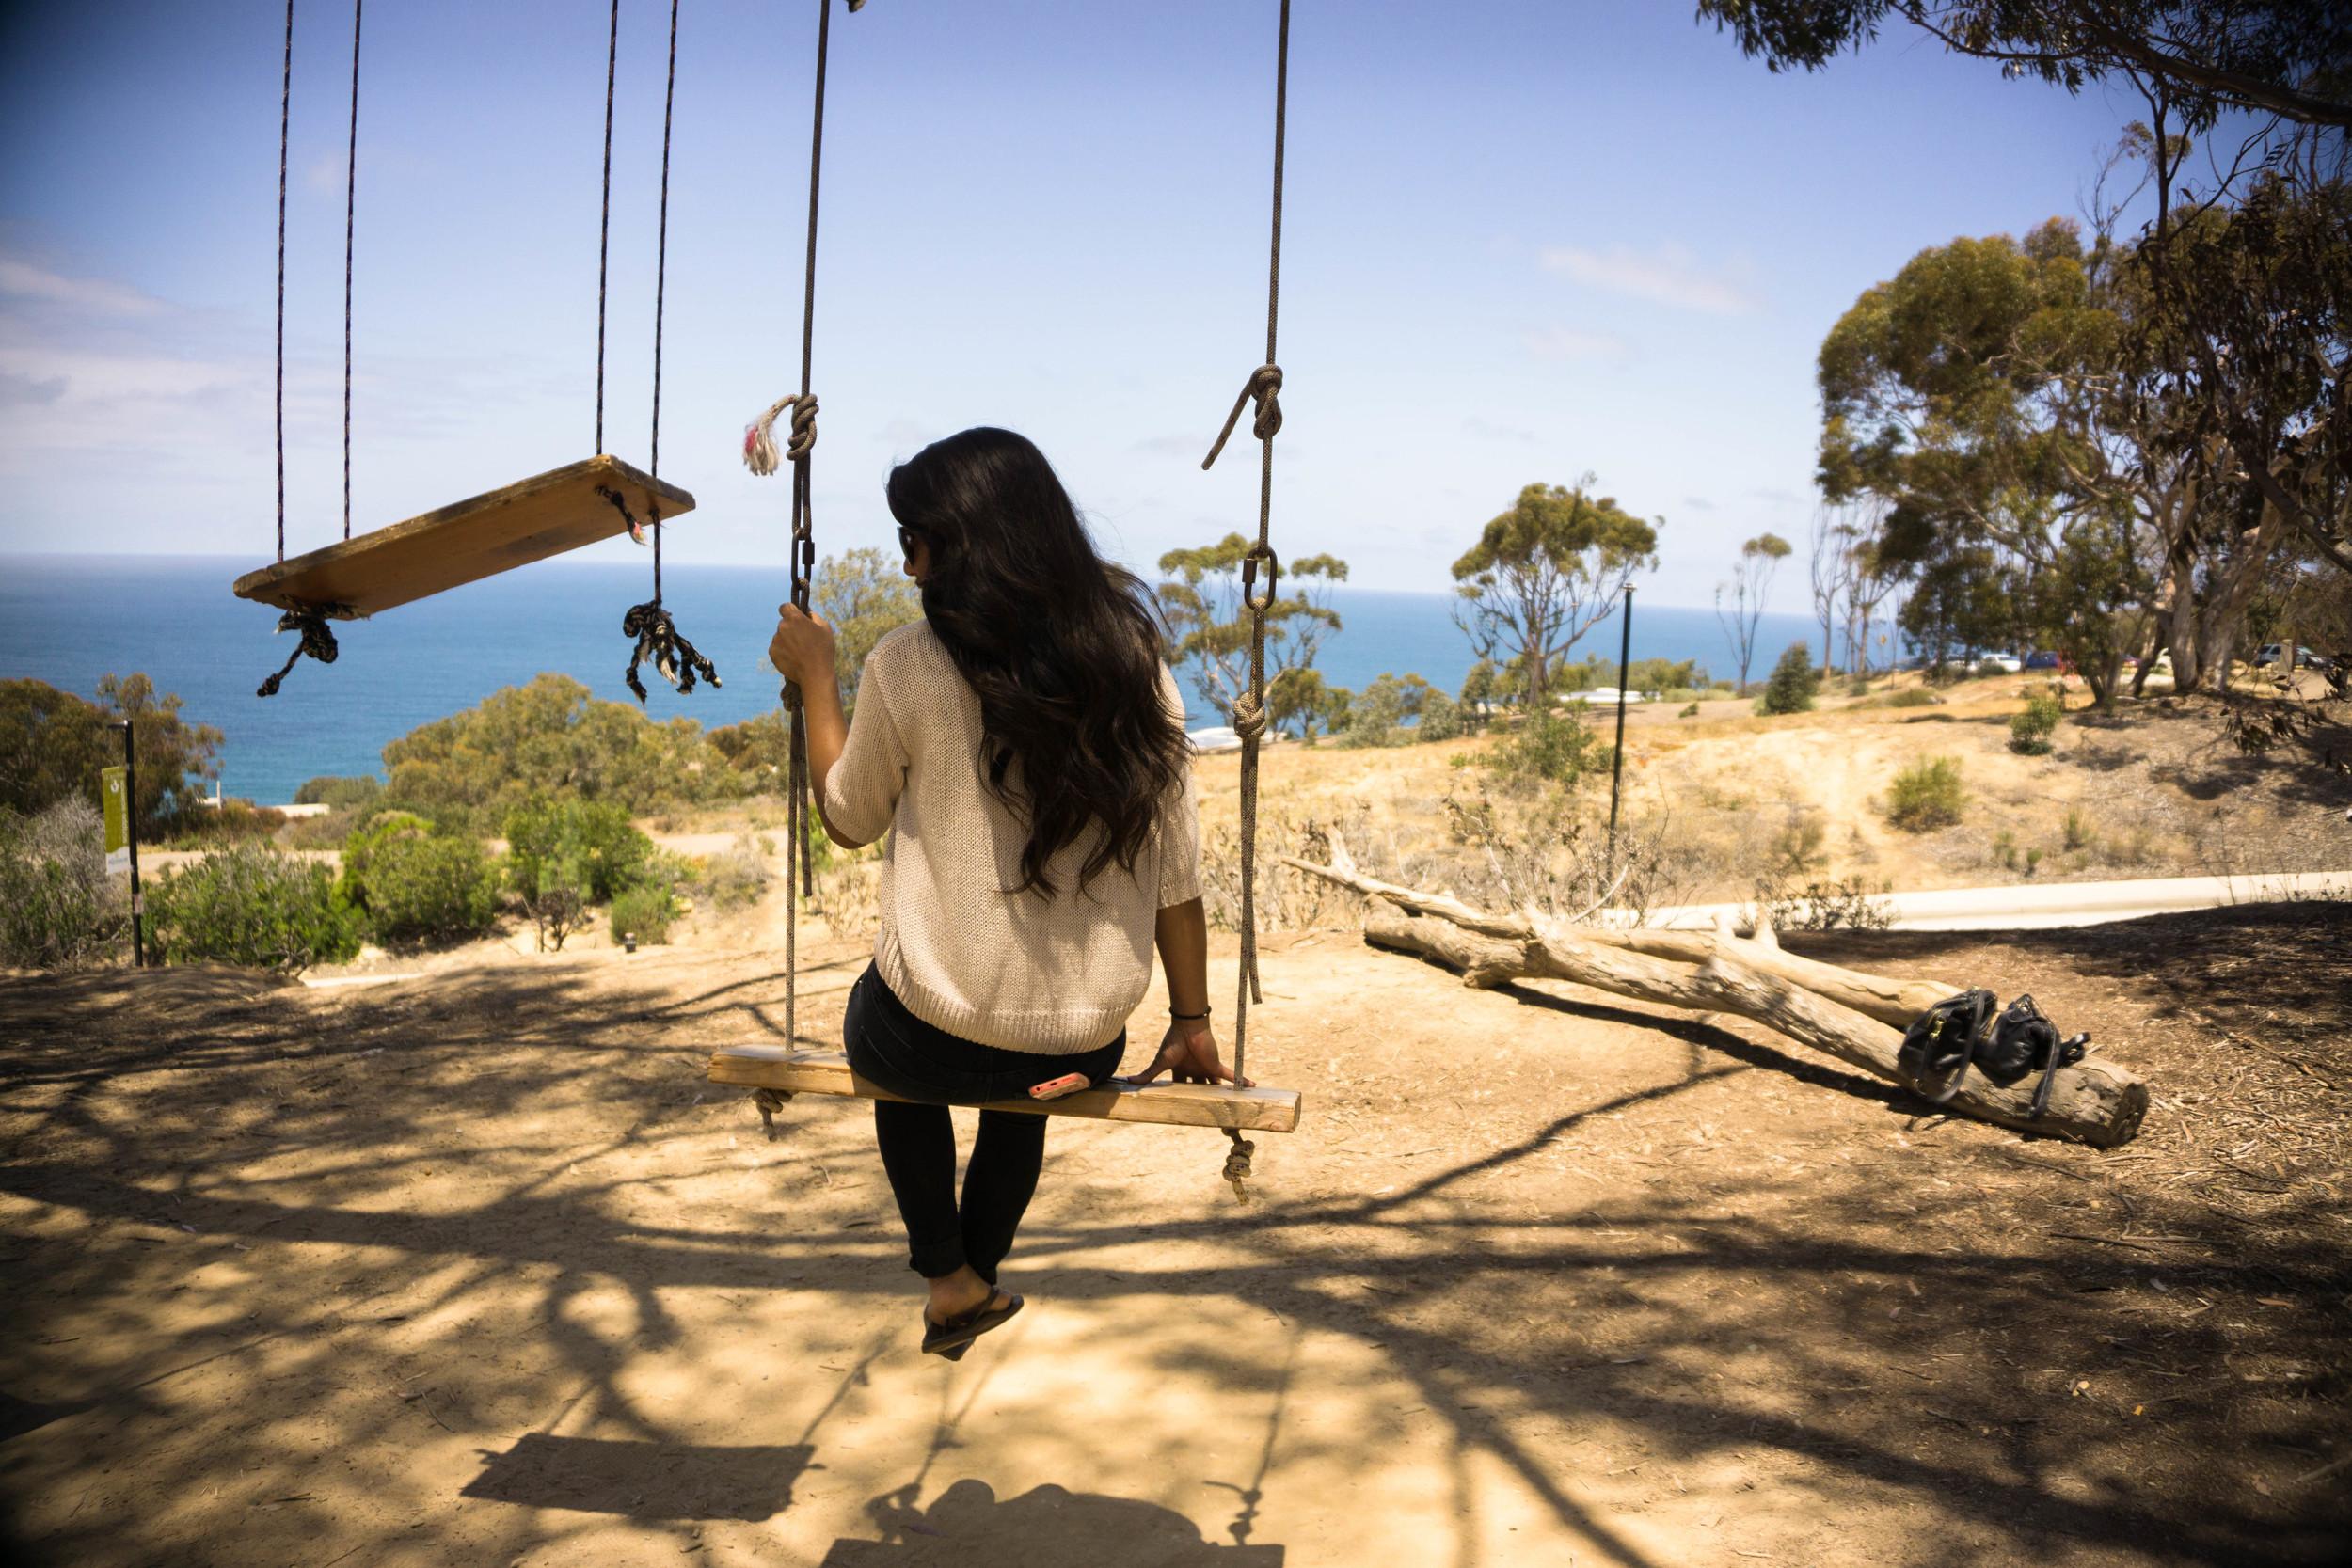 Vanessa on the La Jolla Tree Swings